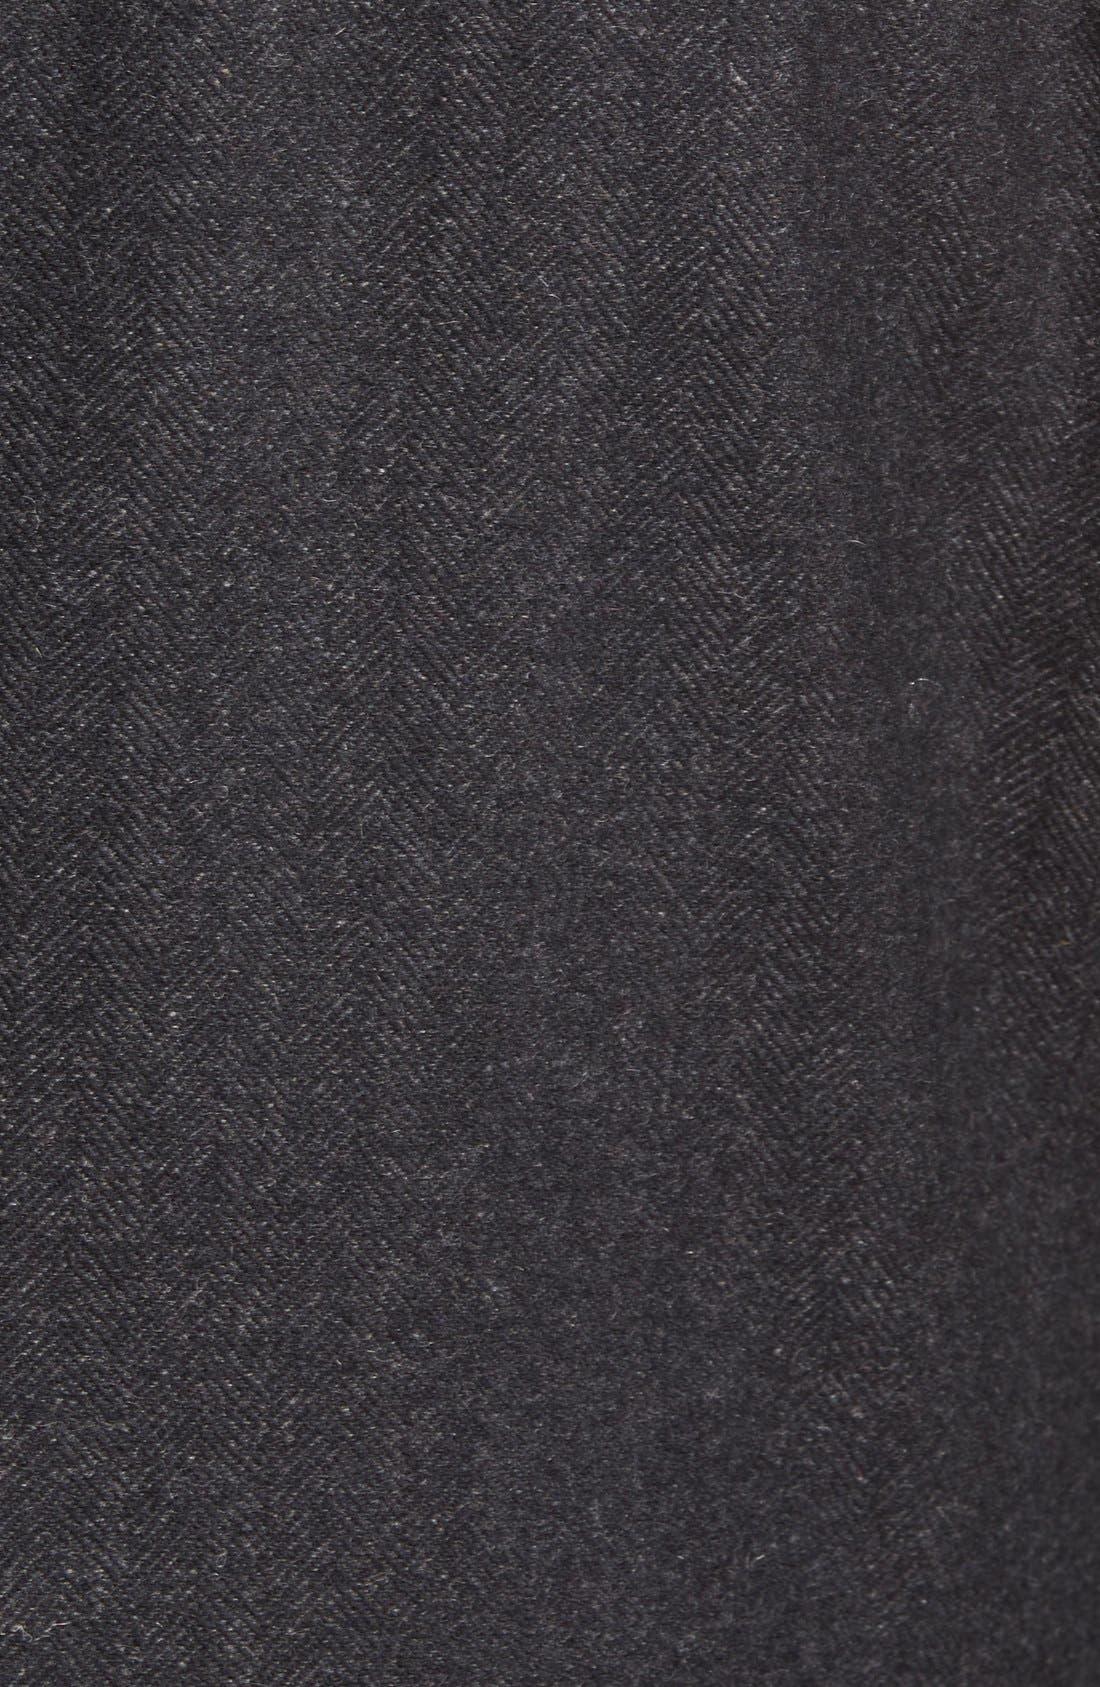 Maitland Modern Fit Wool Blend Overcoat,                             Alternate thumbnail 3, color,                             035